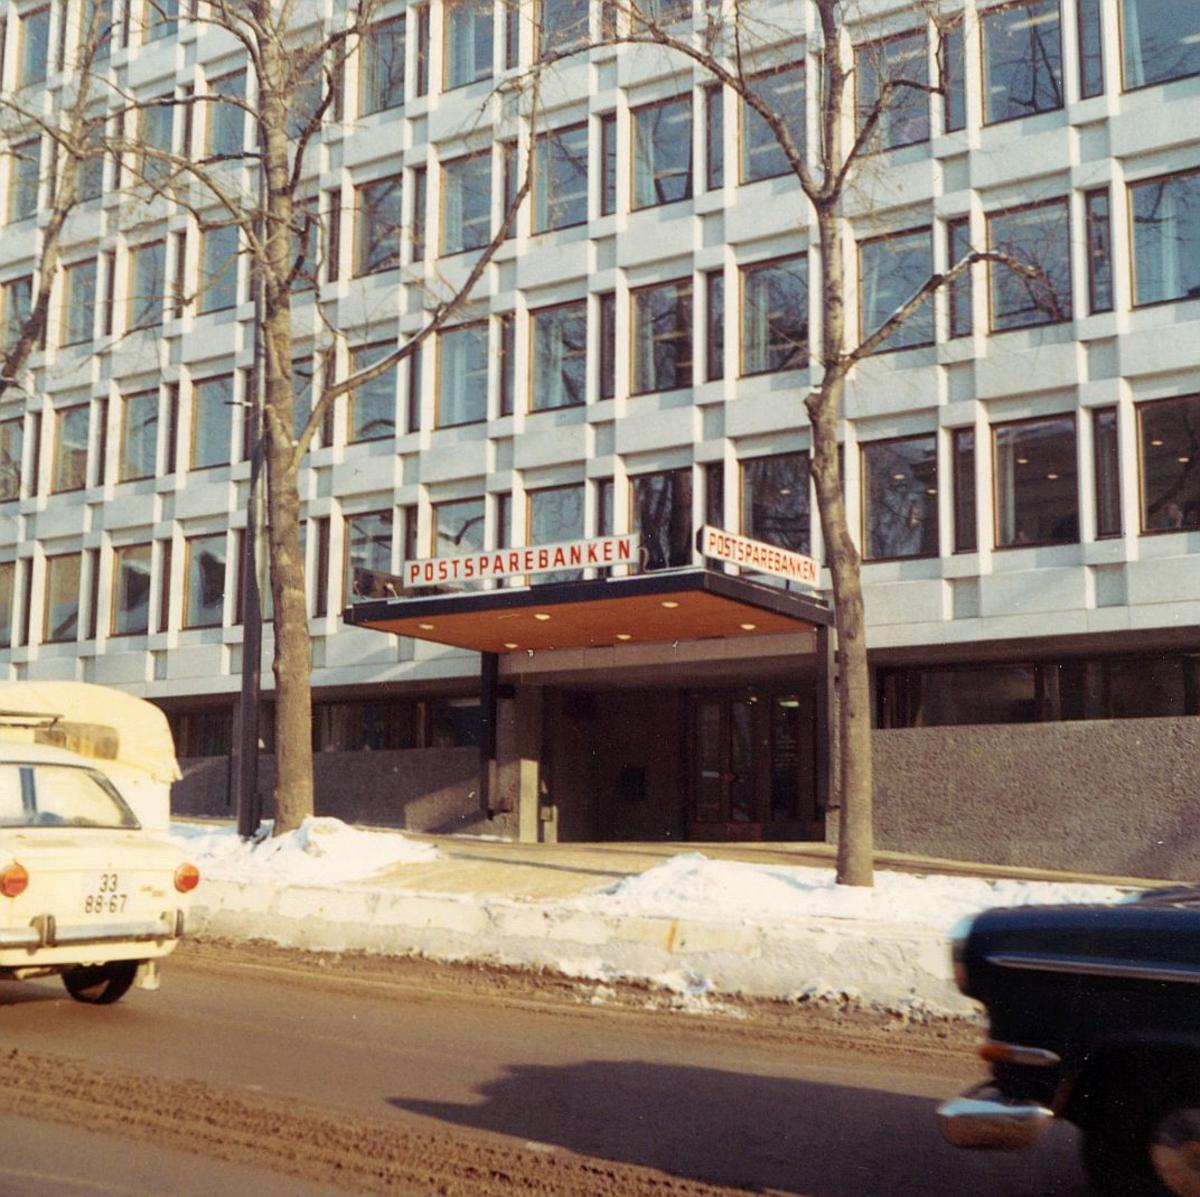 postsparebanken, Akersgata 68, Oslo, eksteriør, snø